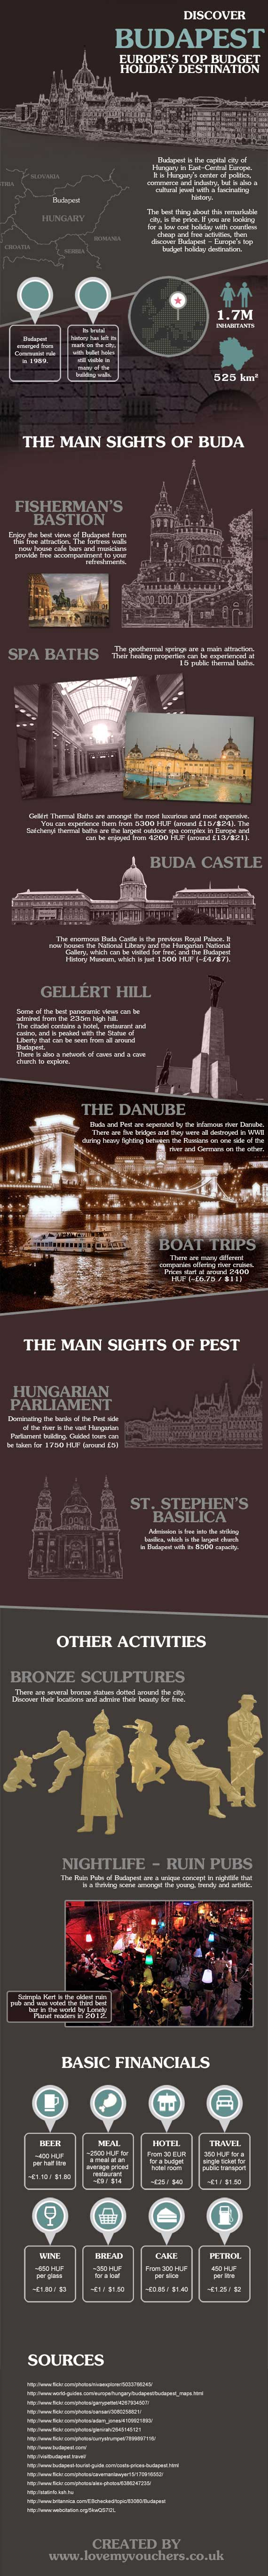 Top Budget Travel Destination